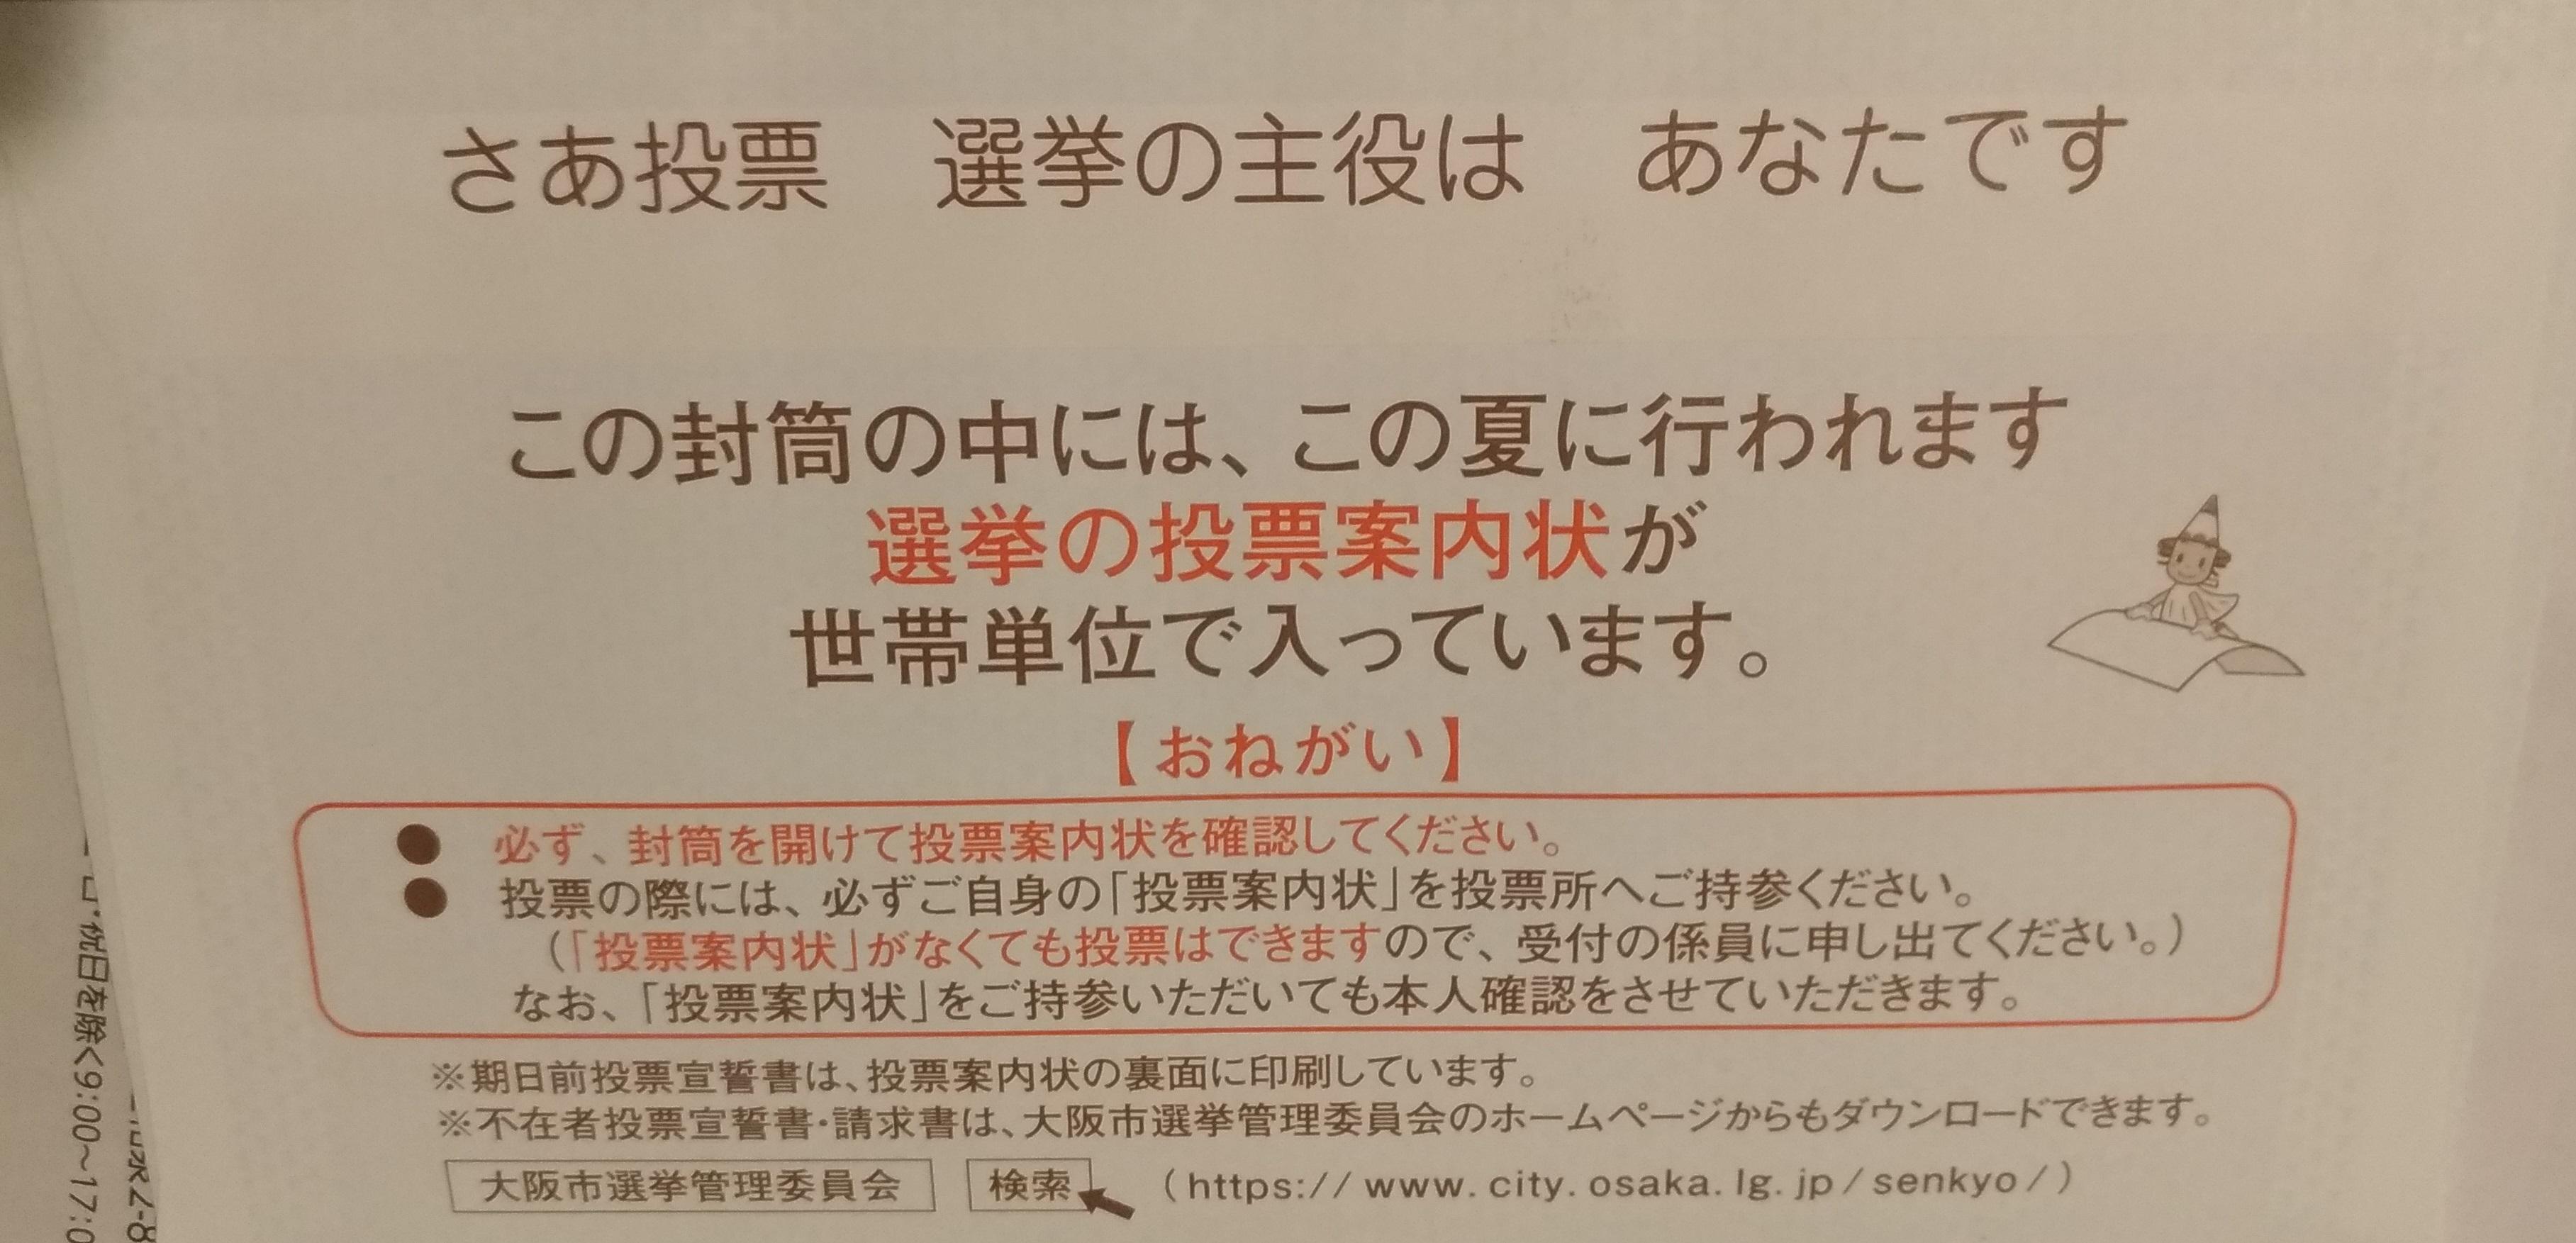 senkyo_osaka_201907_.jpg